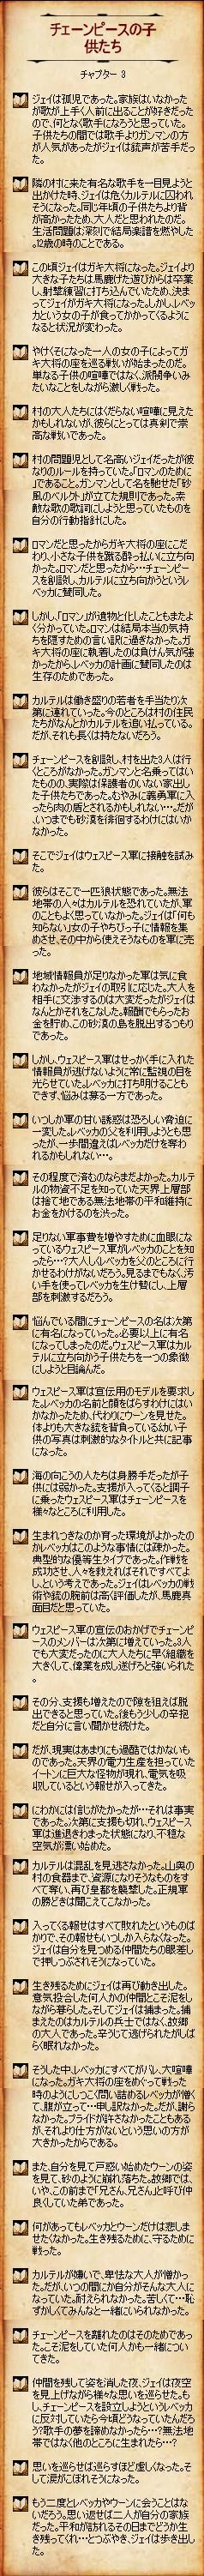 ScreenShot09922.png